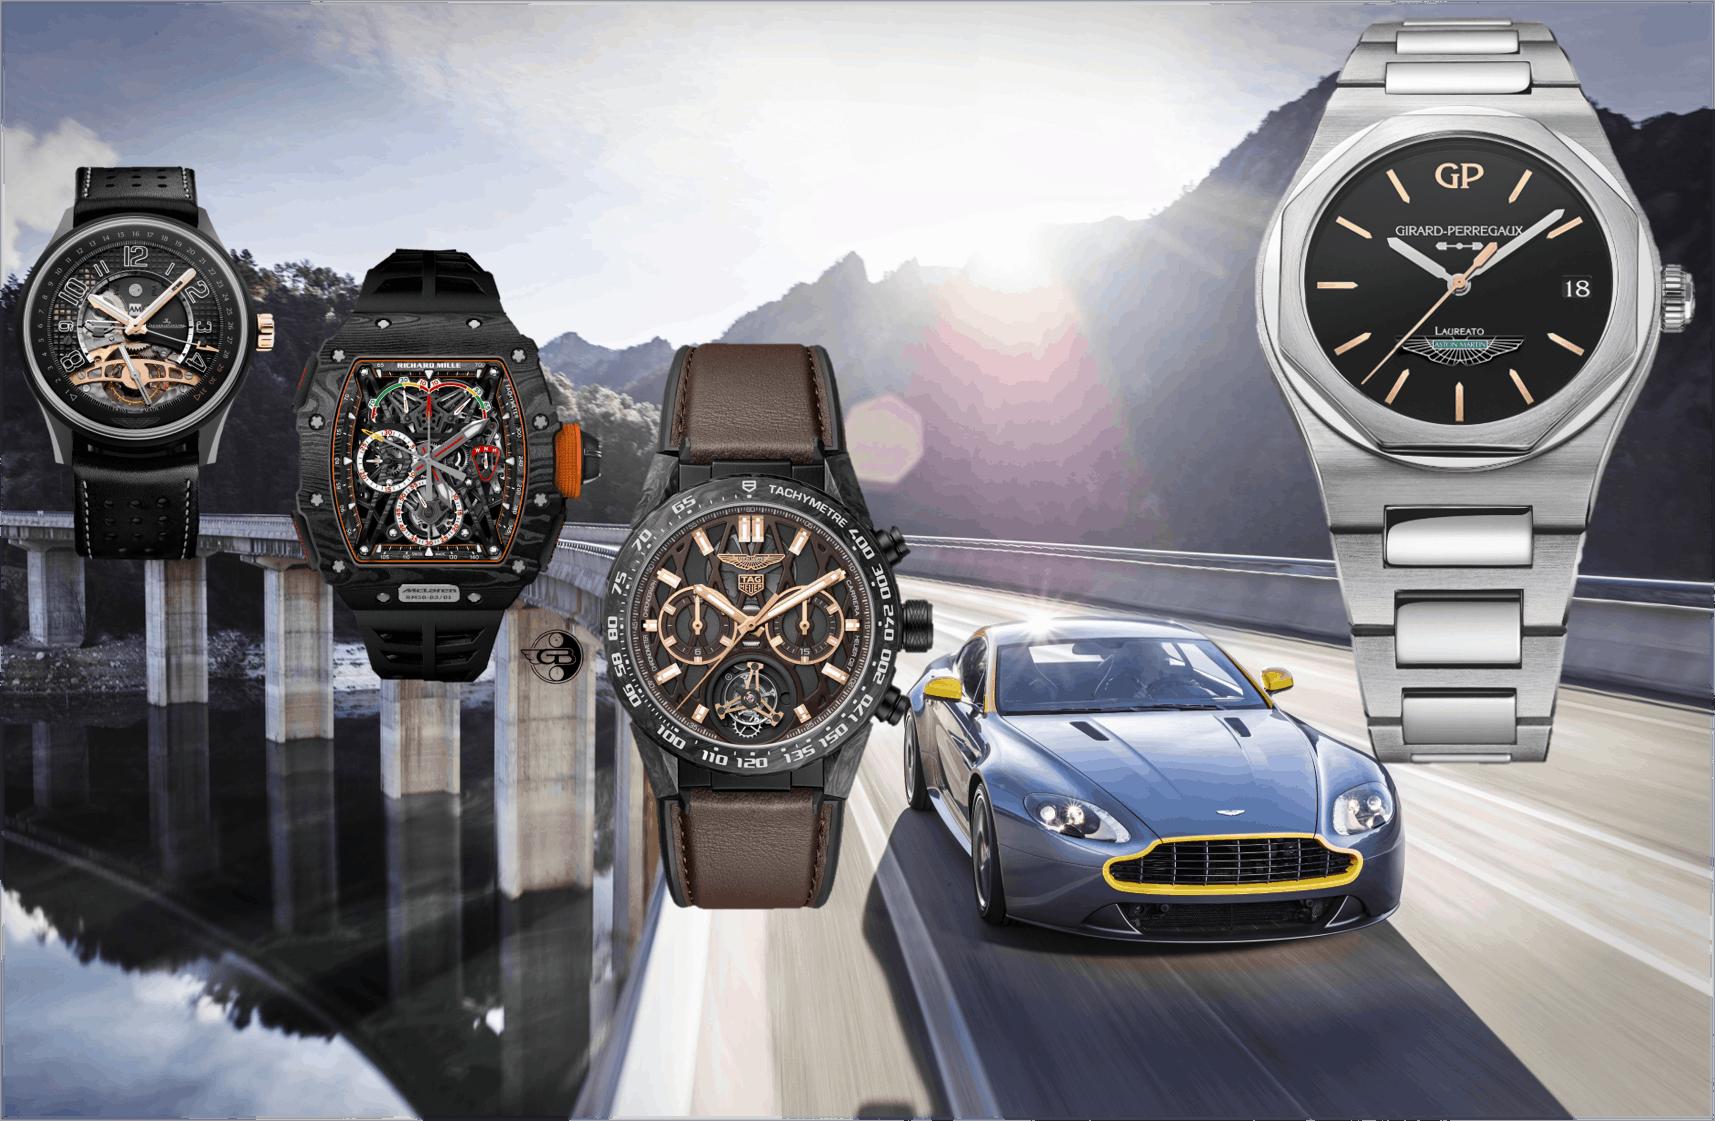 Aston Martin-Girard-PerregauxAston Martin Uhrenpartner: Jaeger-LeCoultre, Richard Mille, TAG Heuer und nun Girard-Perregaux